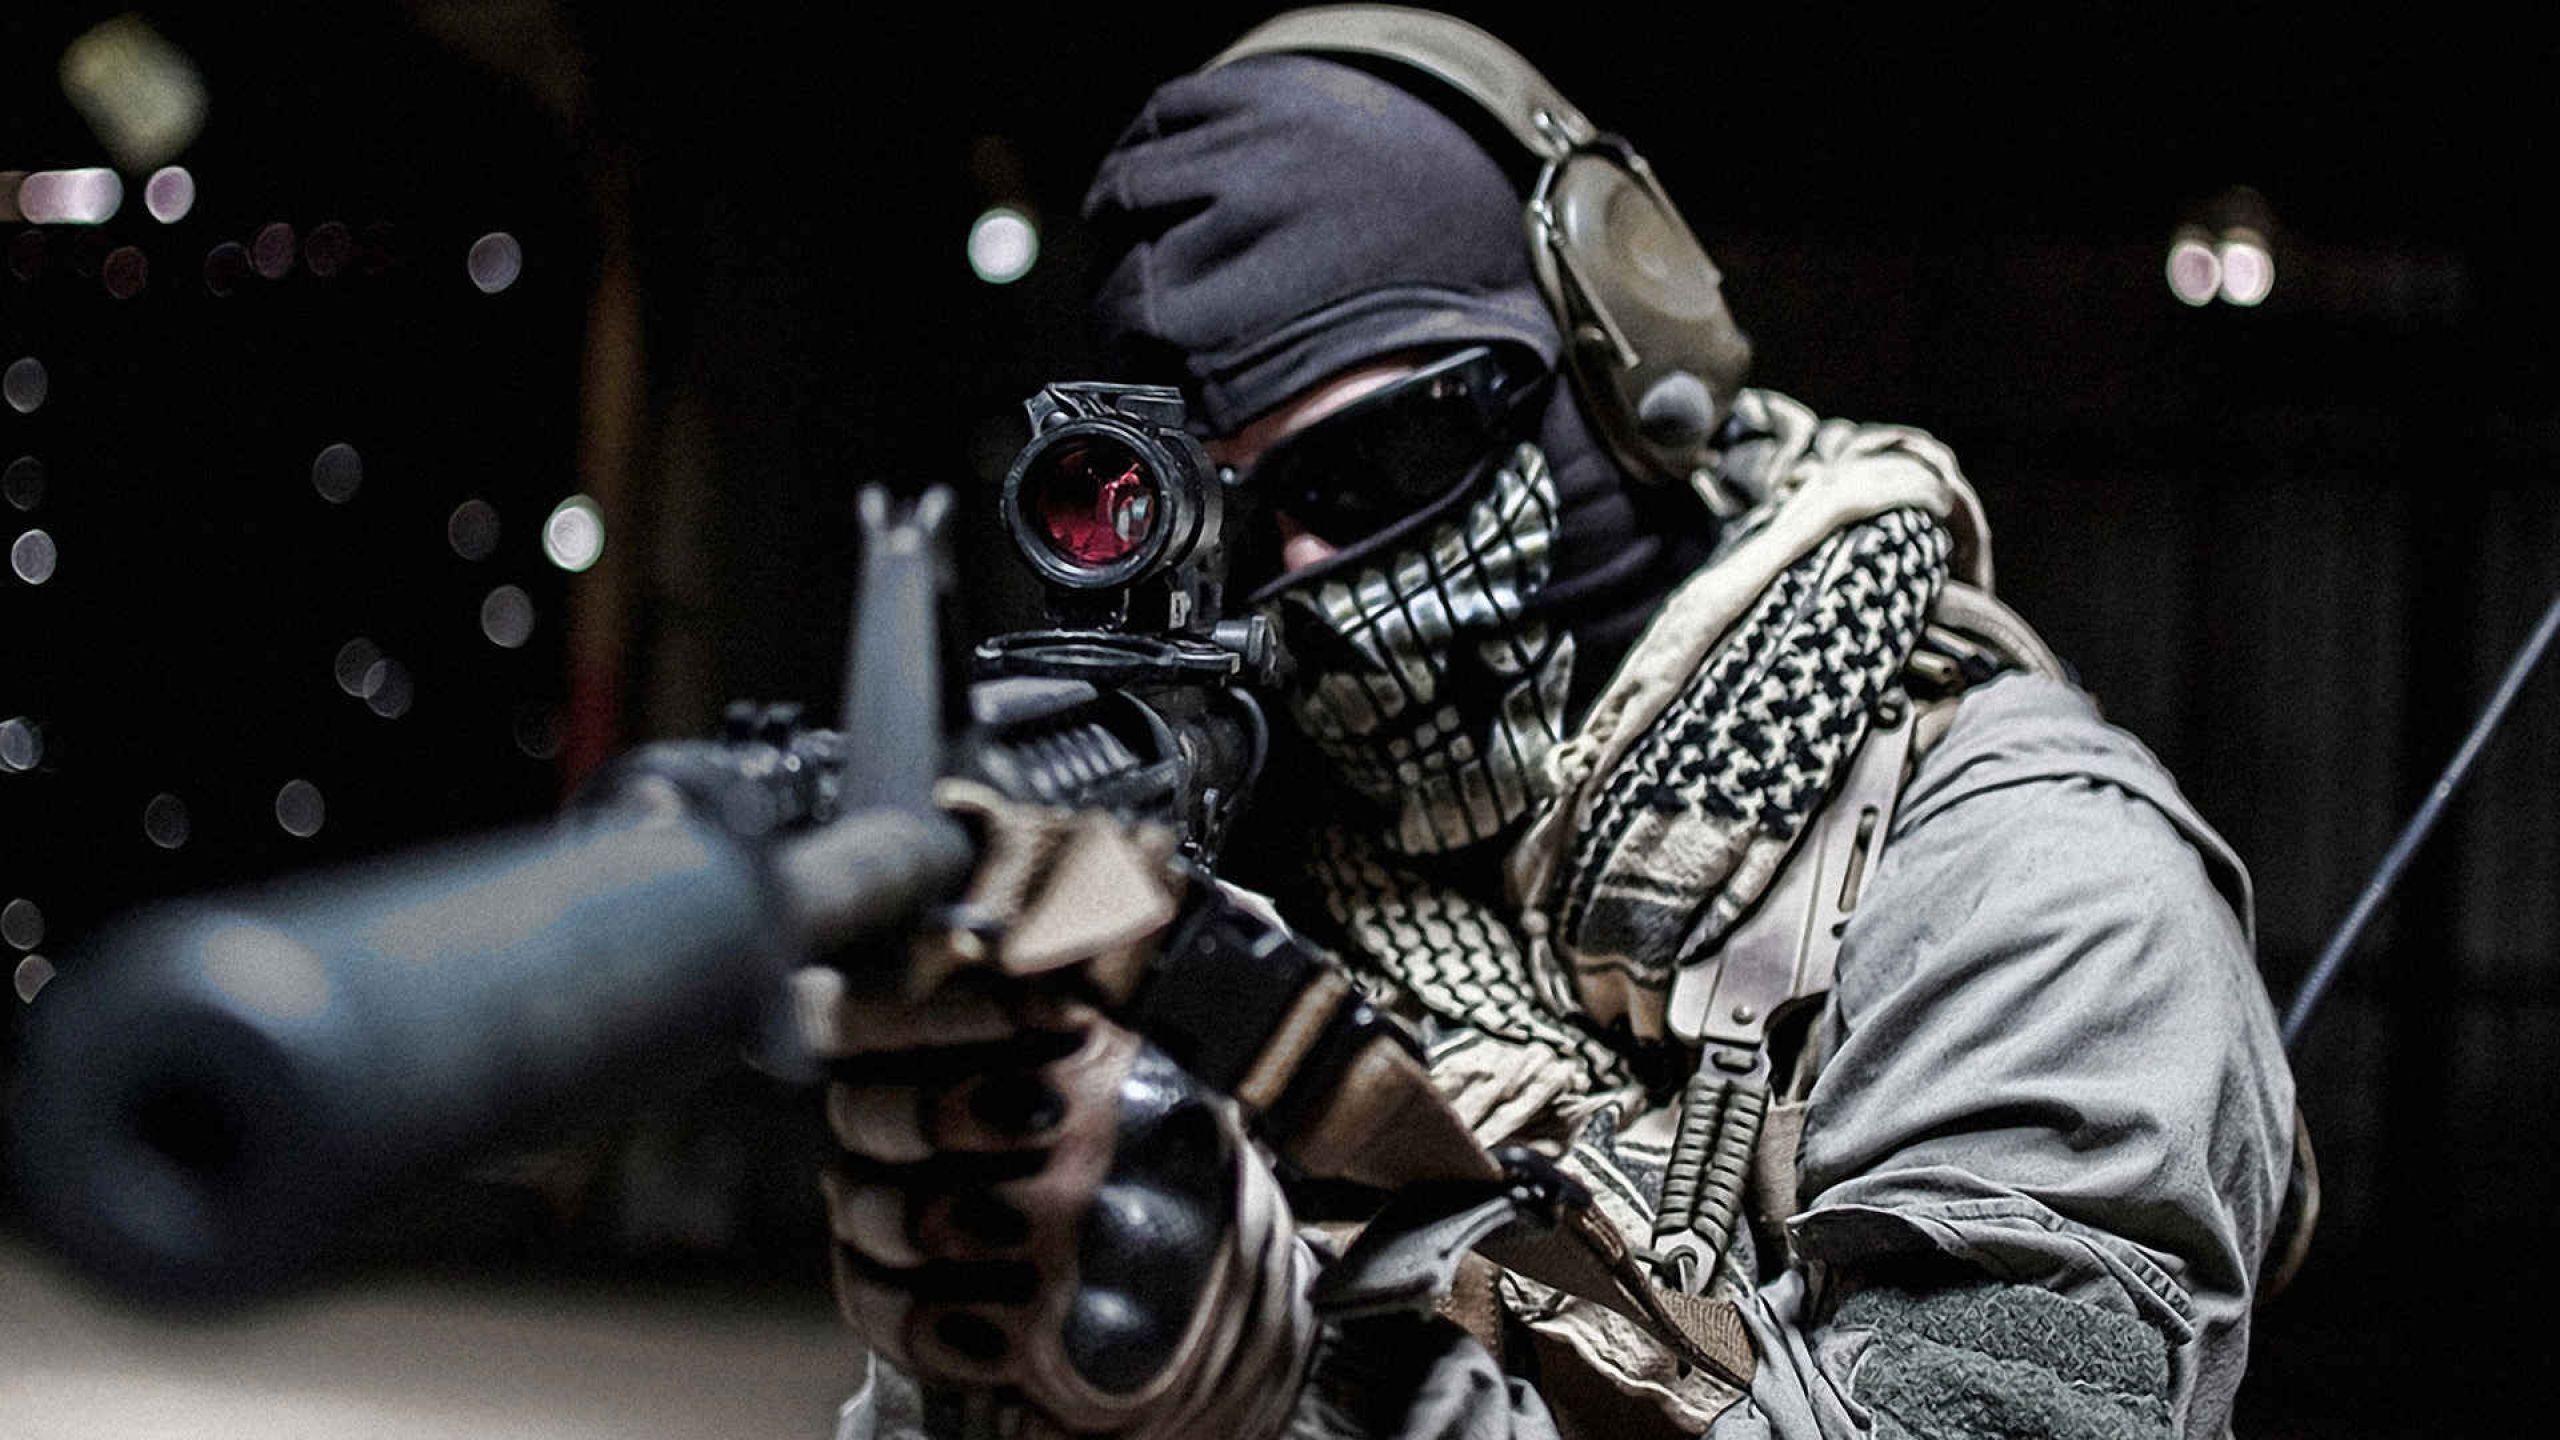 Sniper Ghost Warrior 2 Games Wallpaper 3D 4991 Wallpaper 2560x1440